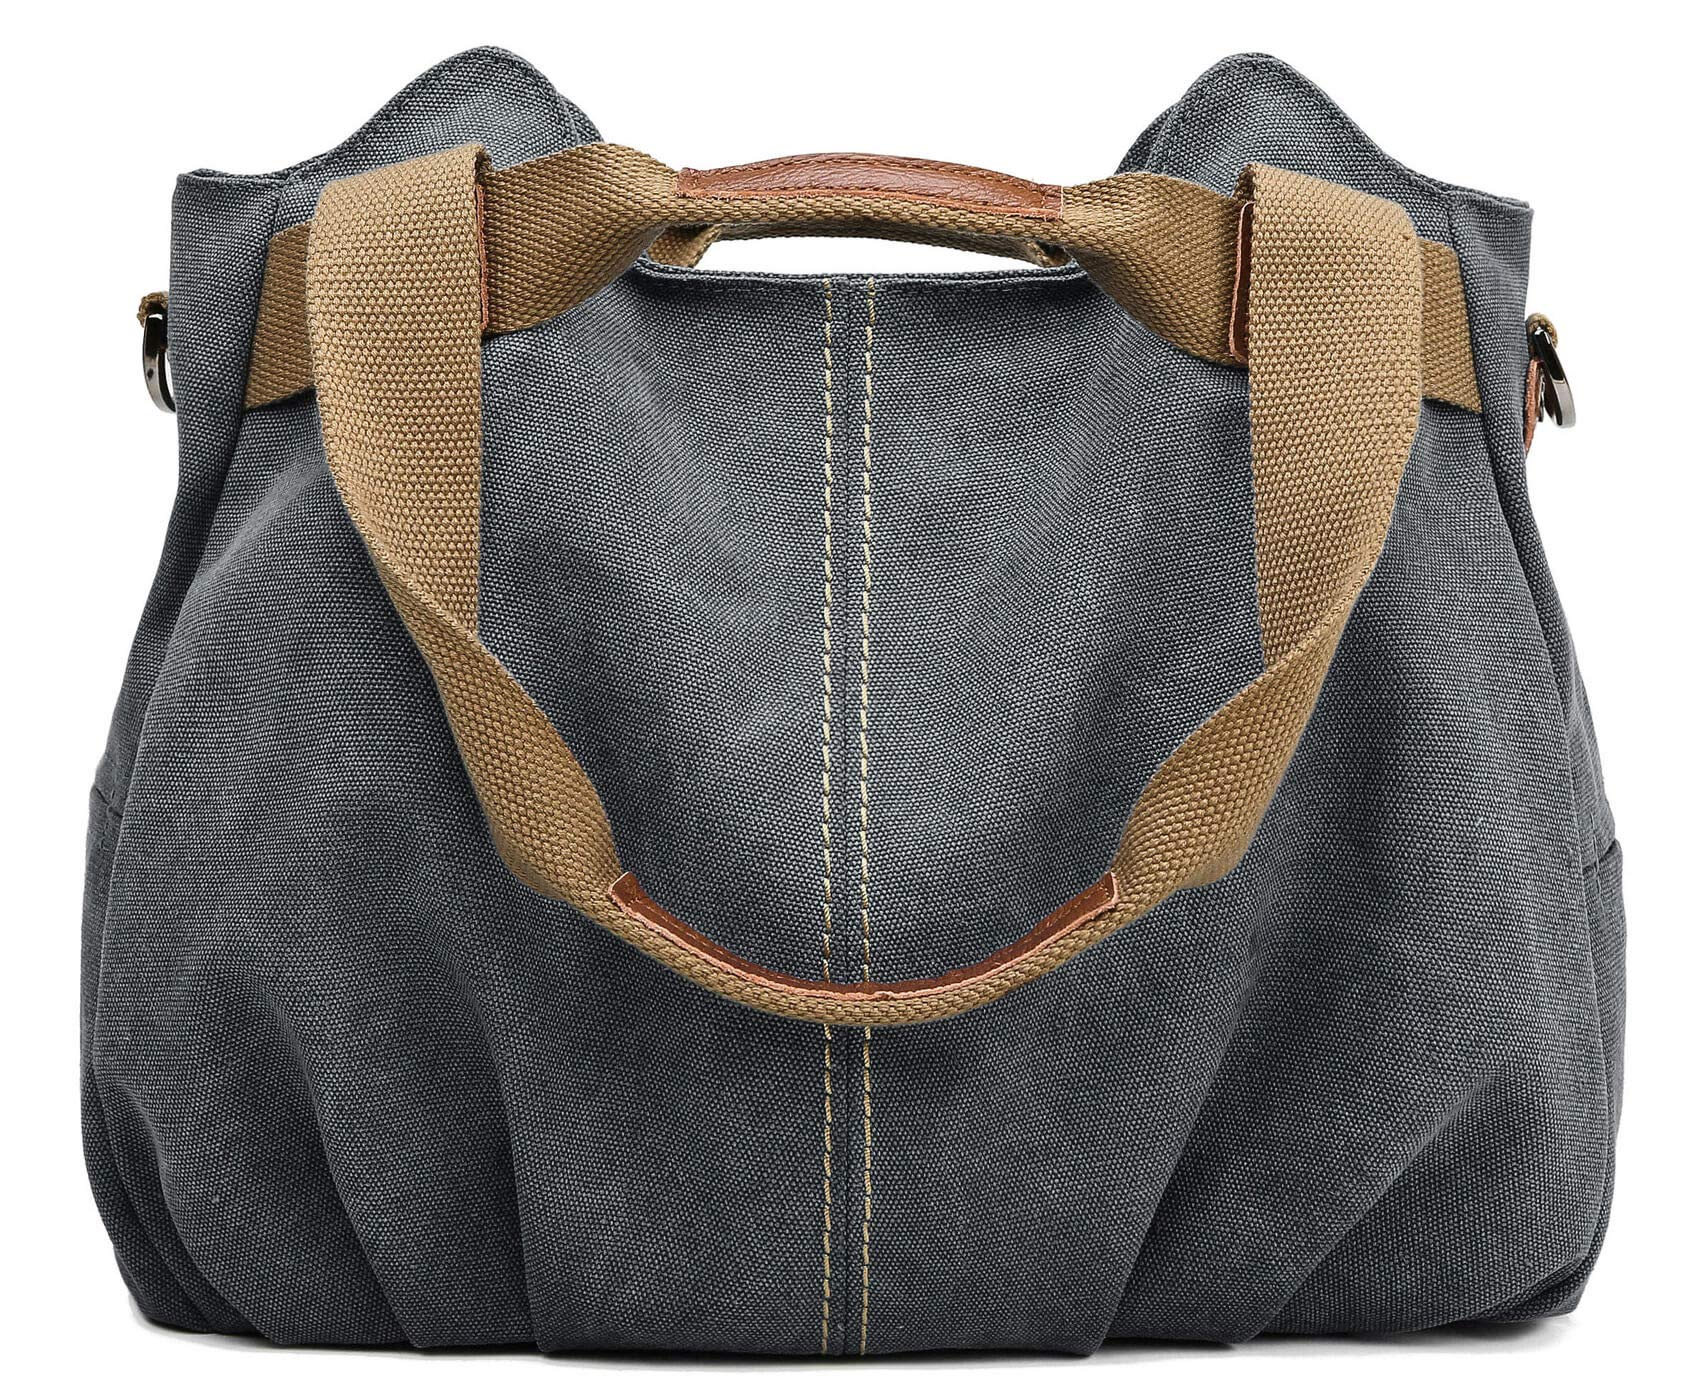 Z-joyee Women's Ladies Casual Vintage Hobo Canvas Daily Purse Top Handle Shoulder Tote Shopper Handbag Satchel Bag by Z-joyee